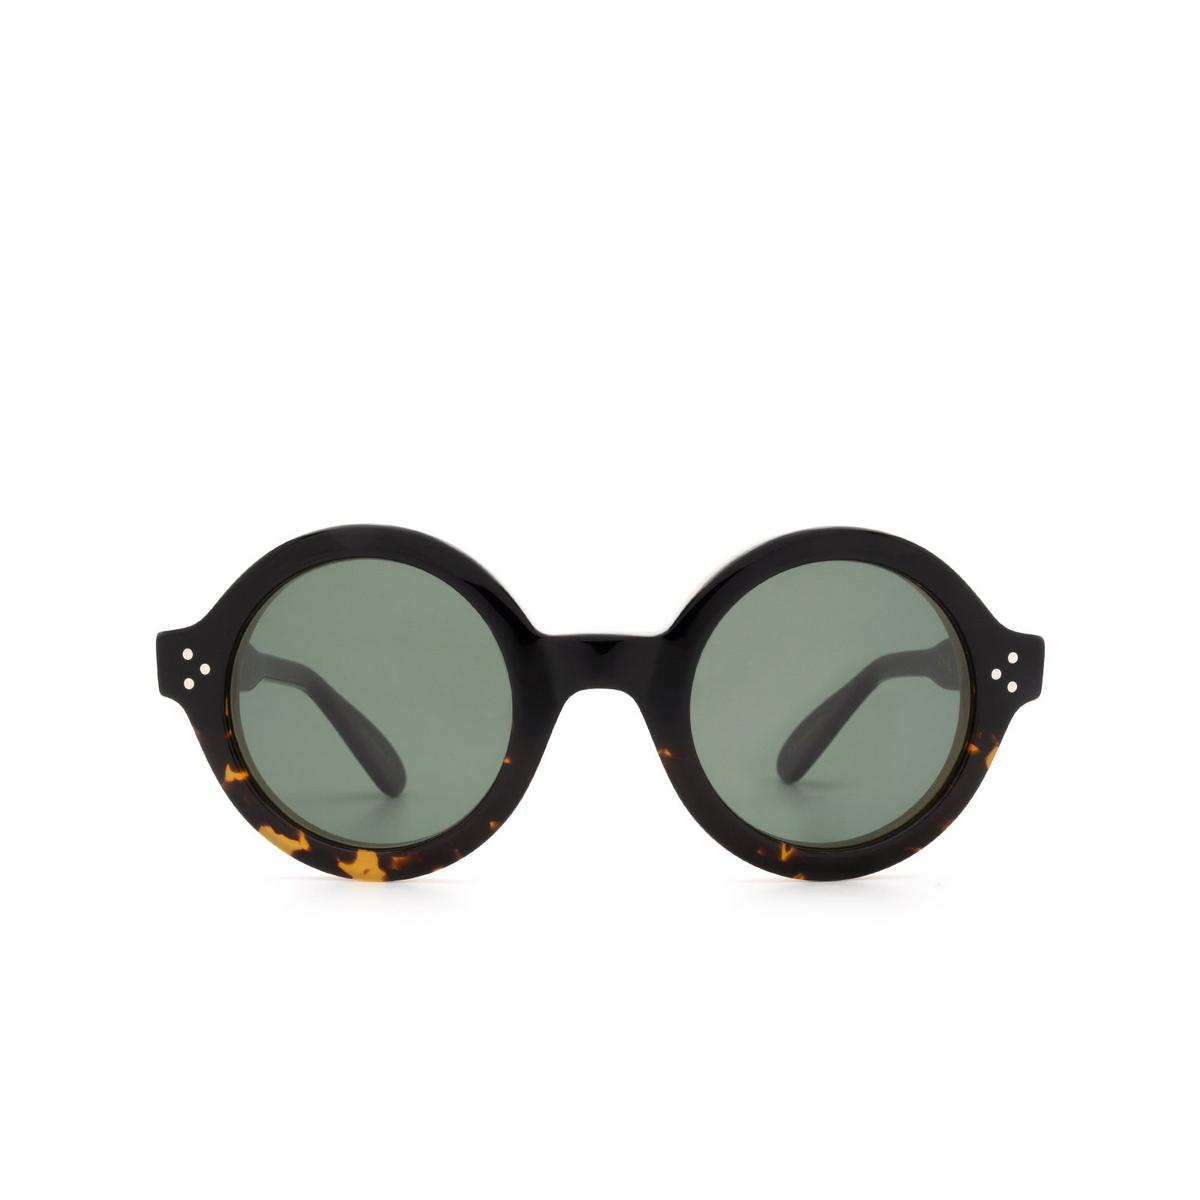 Lesca® Round Sunglasses: Phil Sun color Dark Havana A1 - front view.